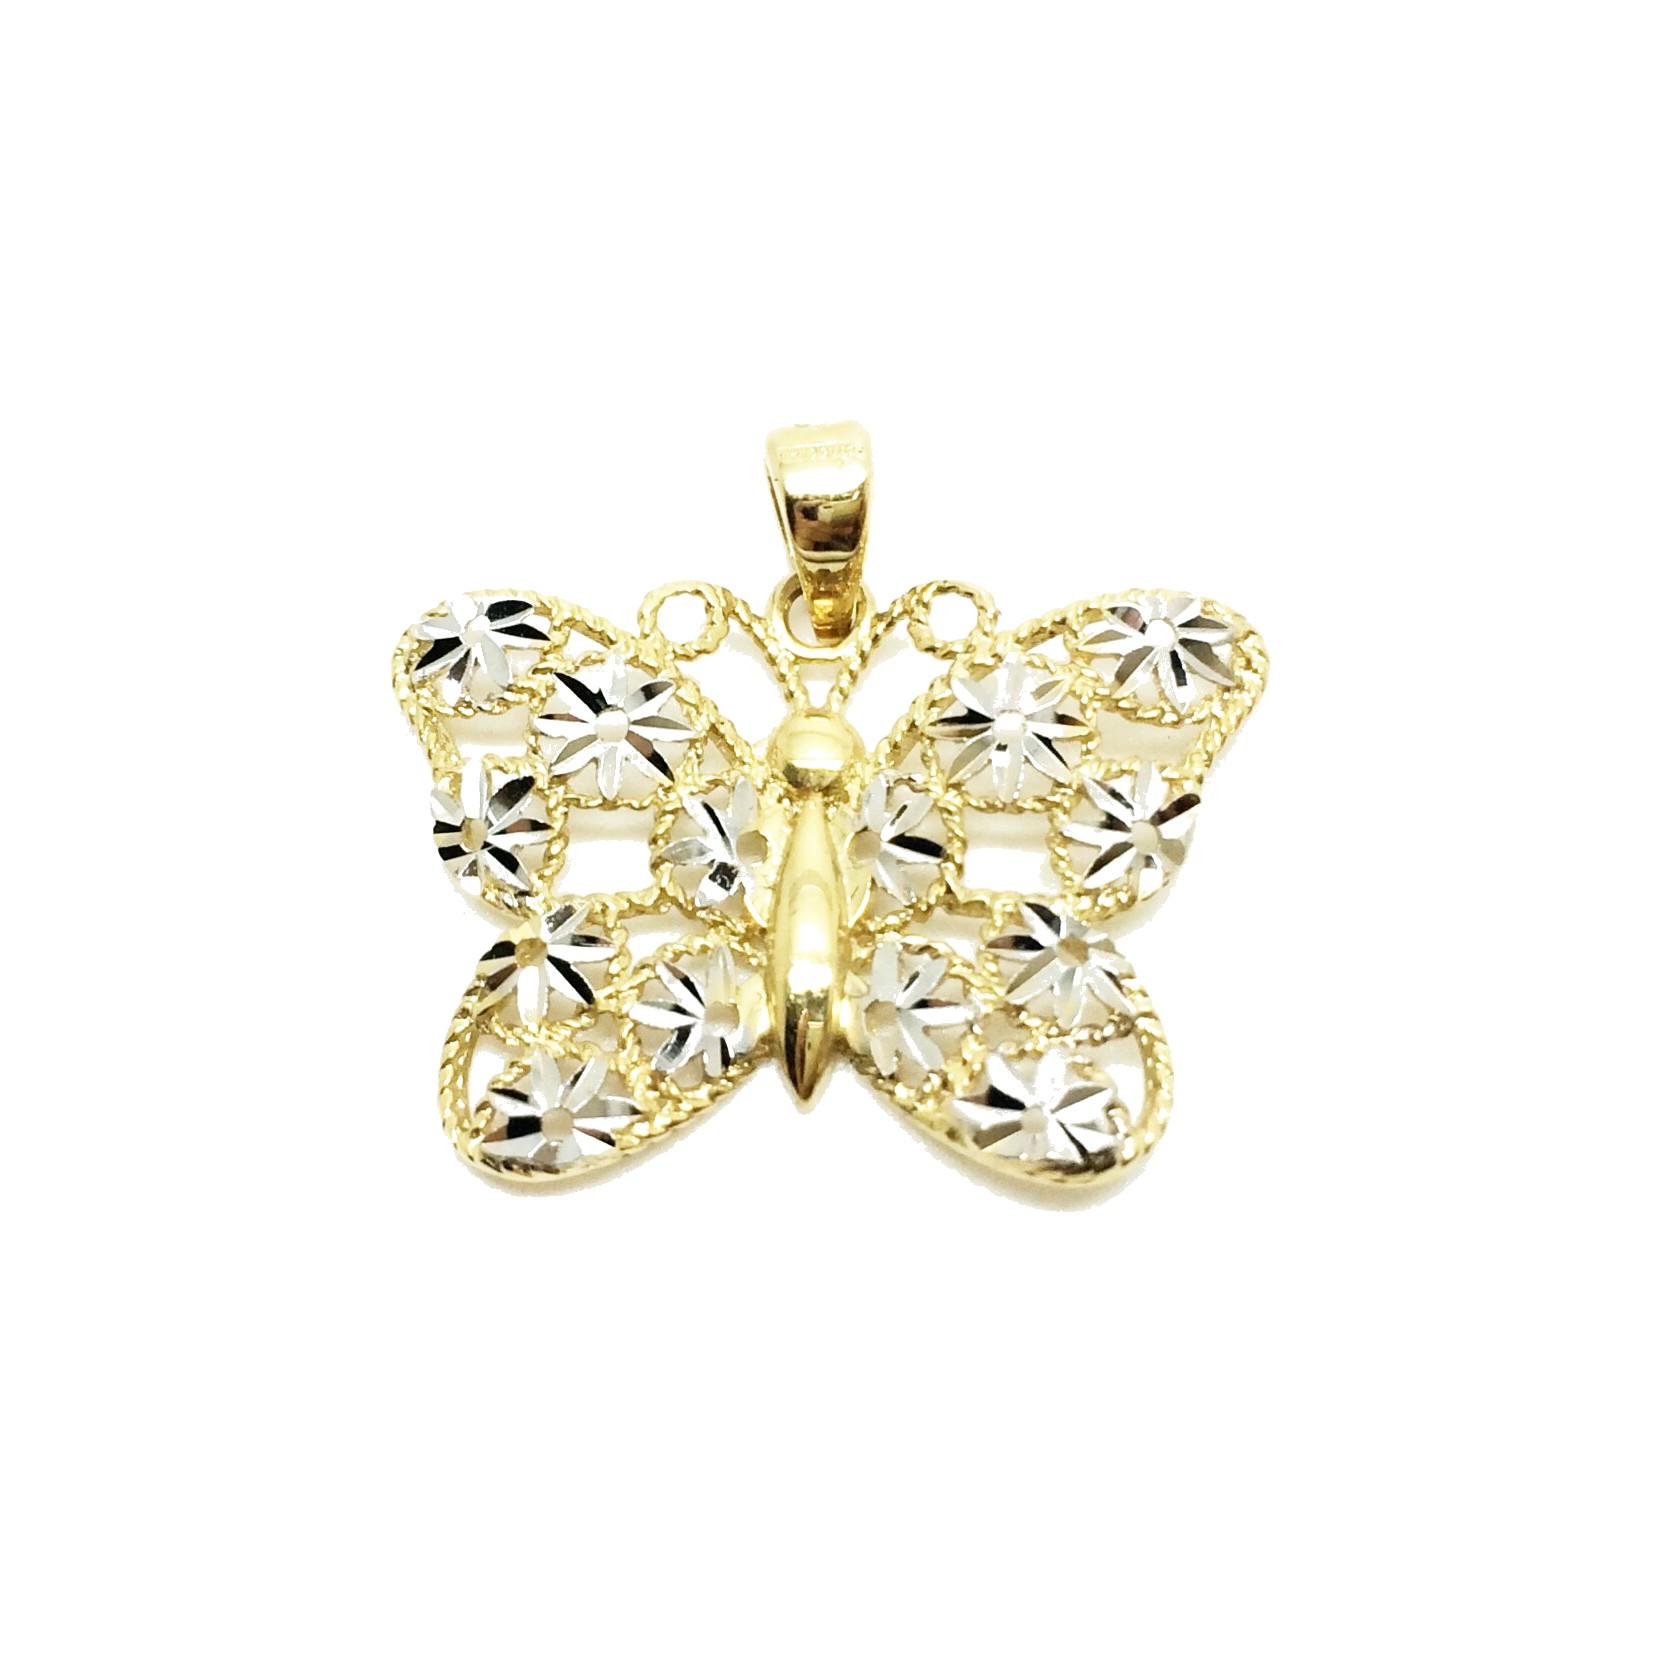 2b8f12280ffd Colgante de oro mariposa Joyería Juan Luis Larráyoz Pamplona